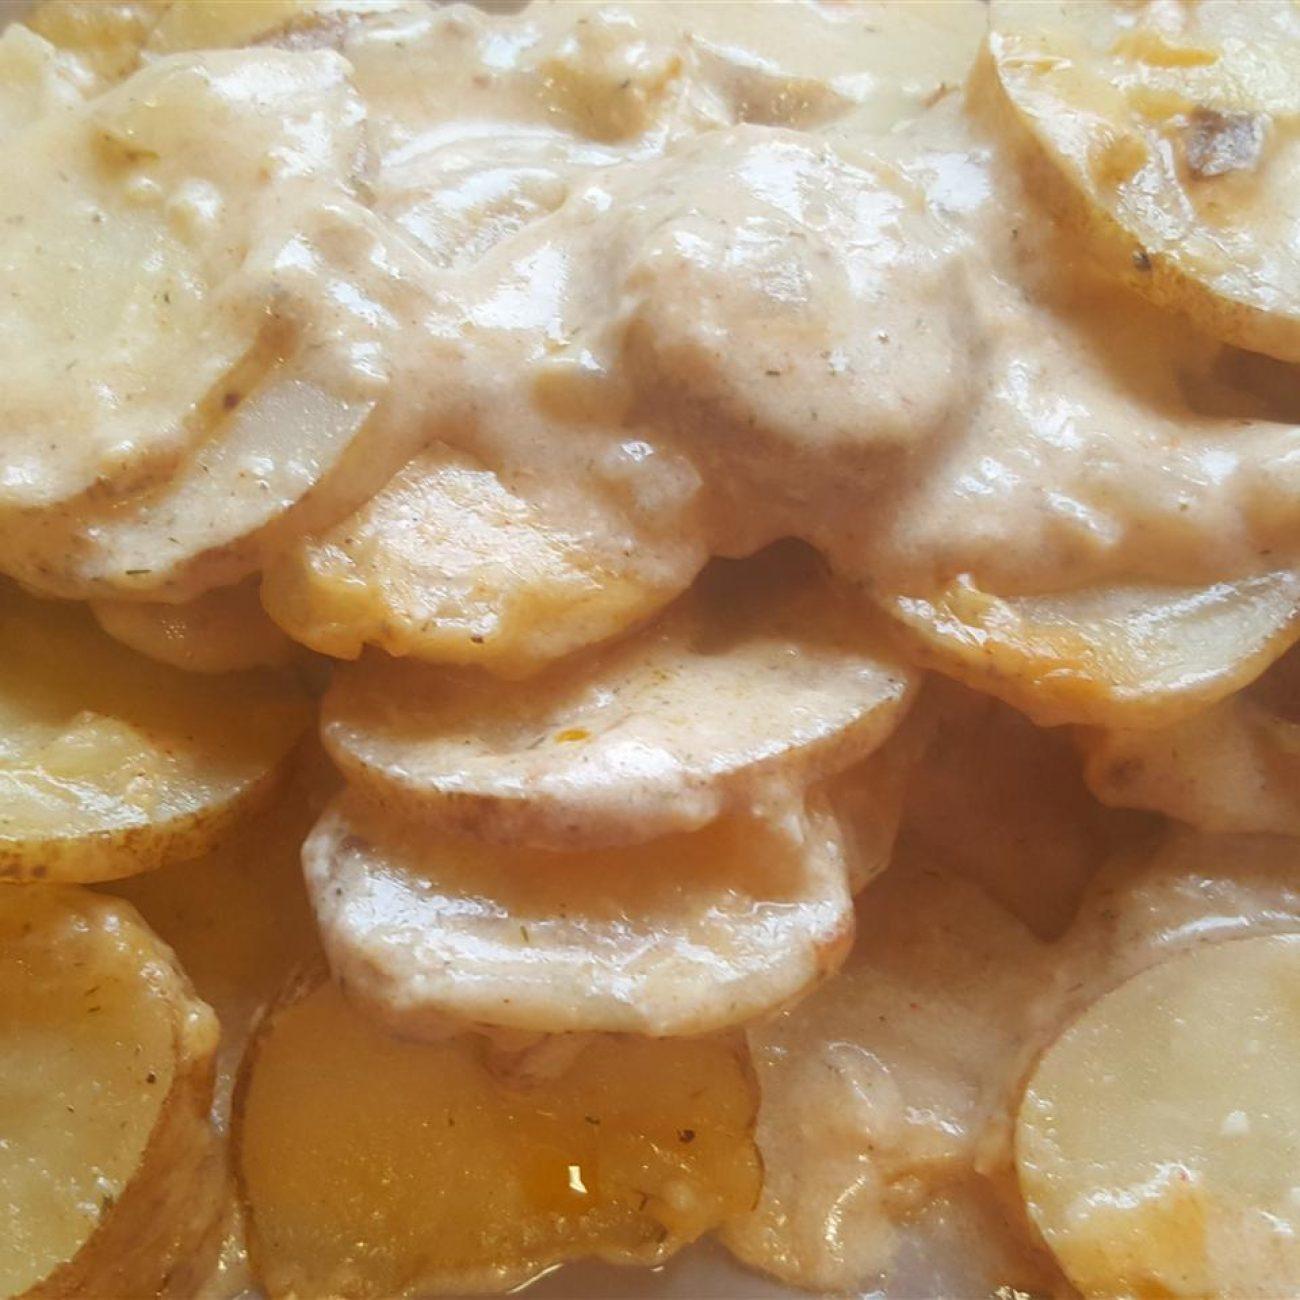 Baked Scalloped Potatoes